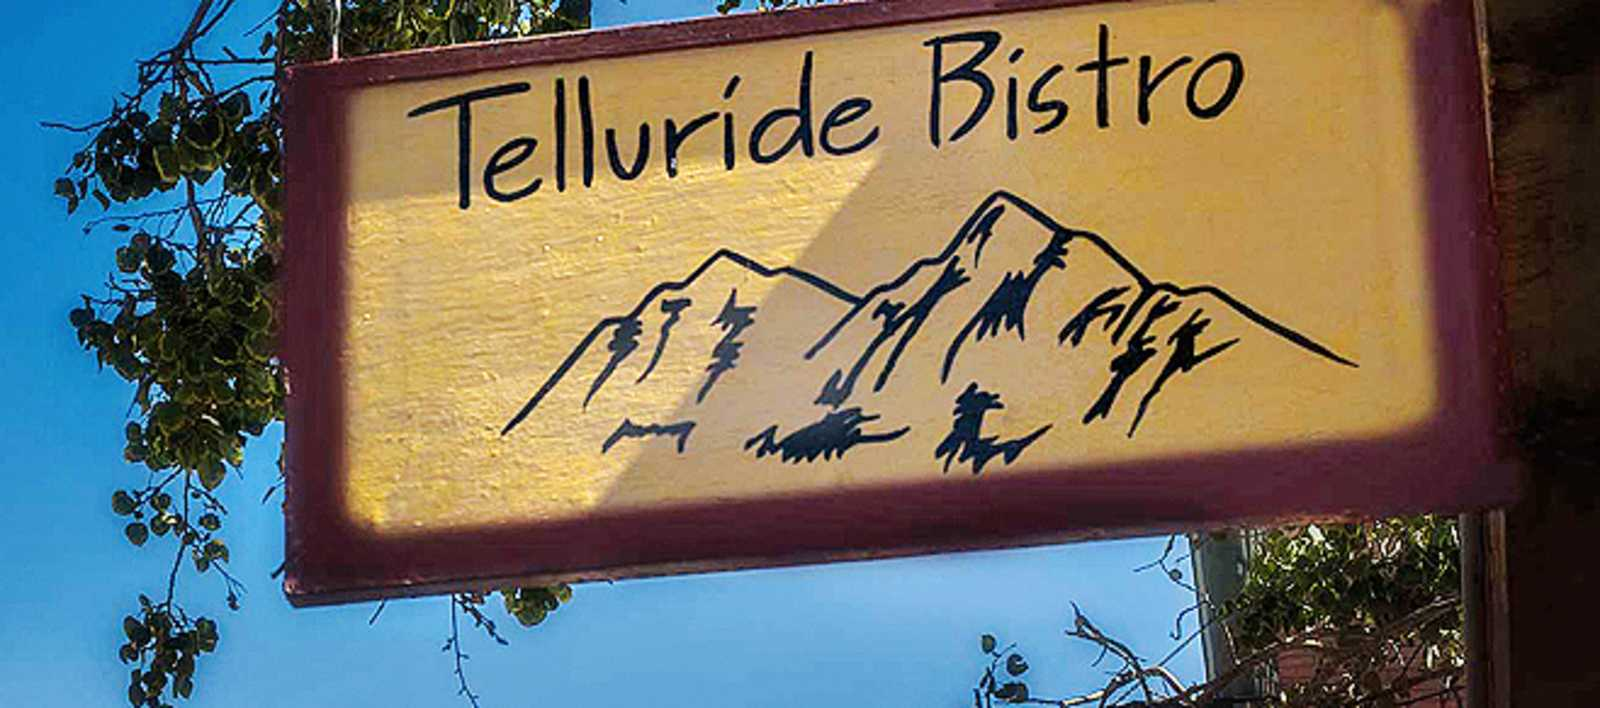 Telluride Bistro